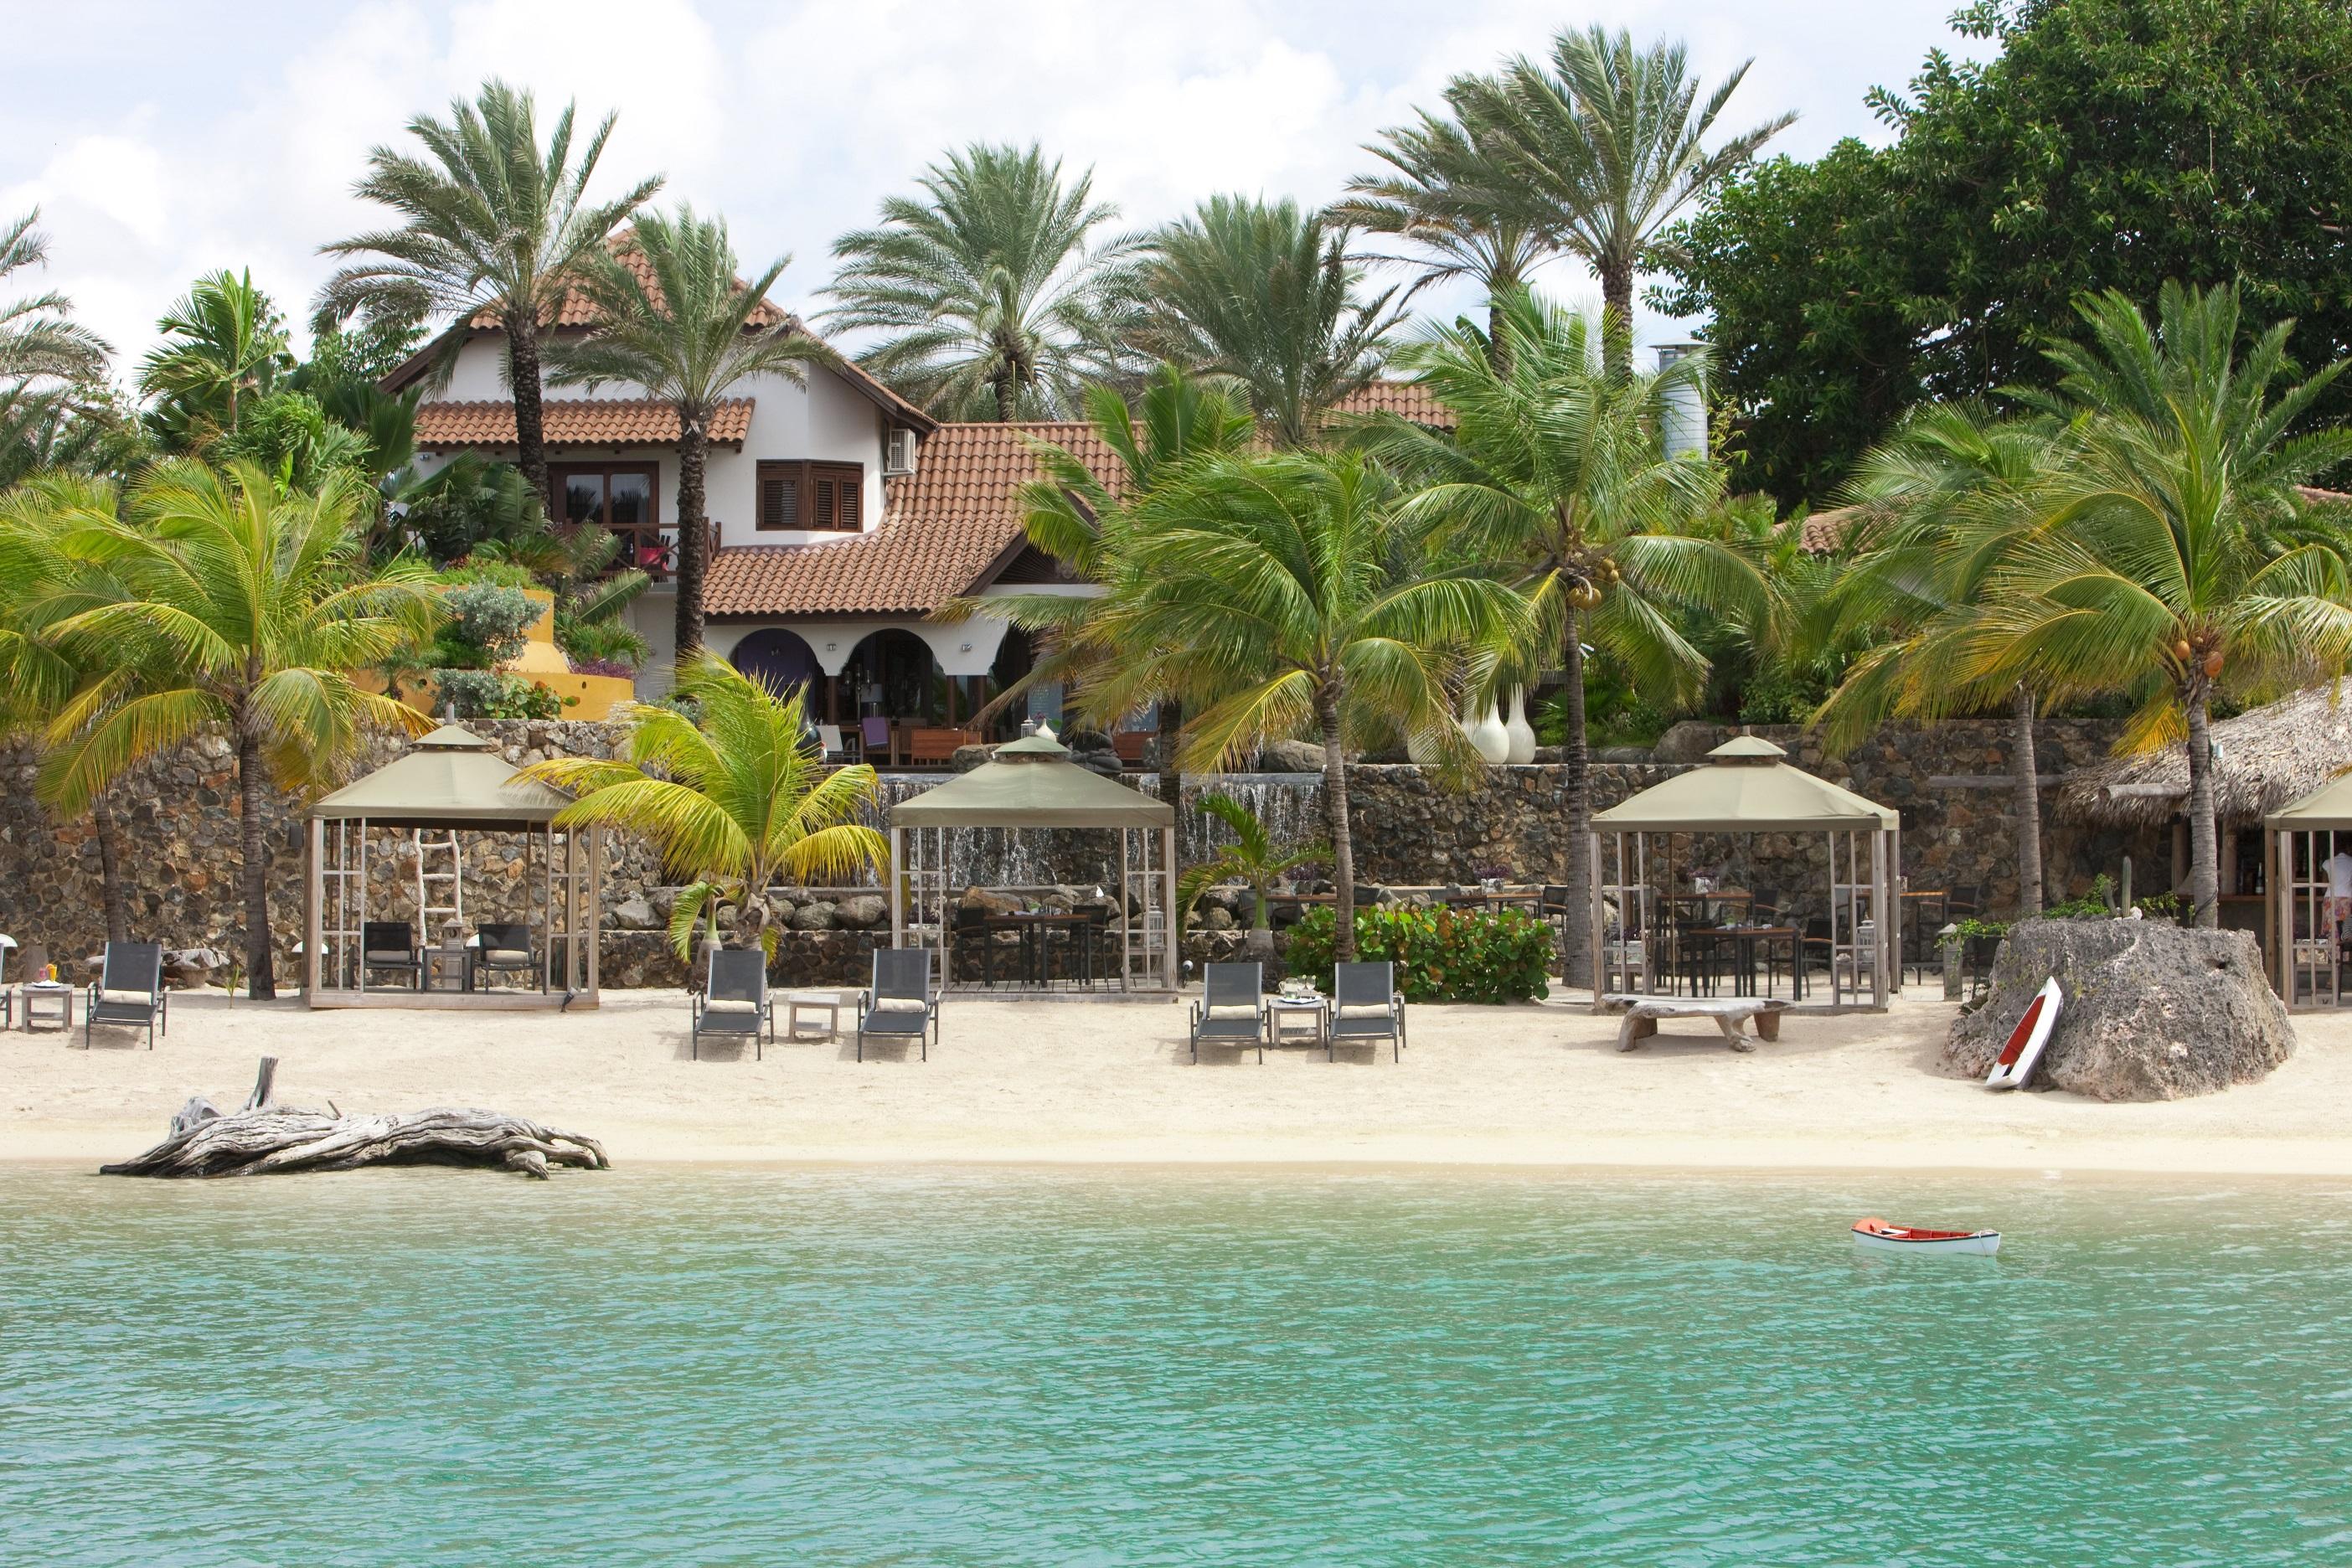 Beach Bibi Island View of Master Villa.jpg